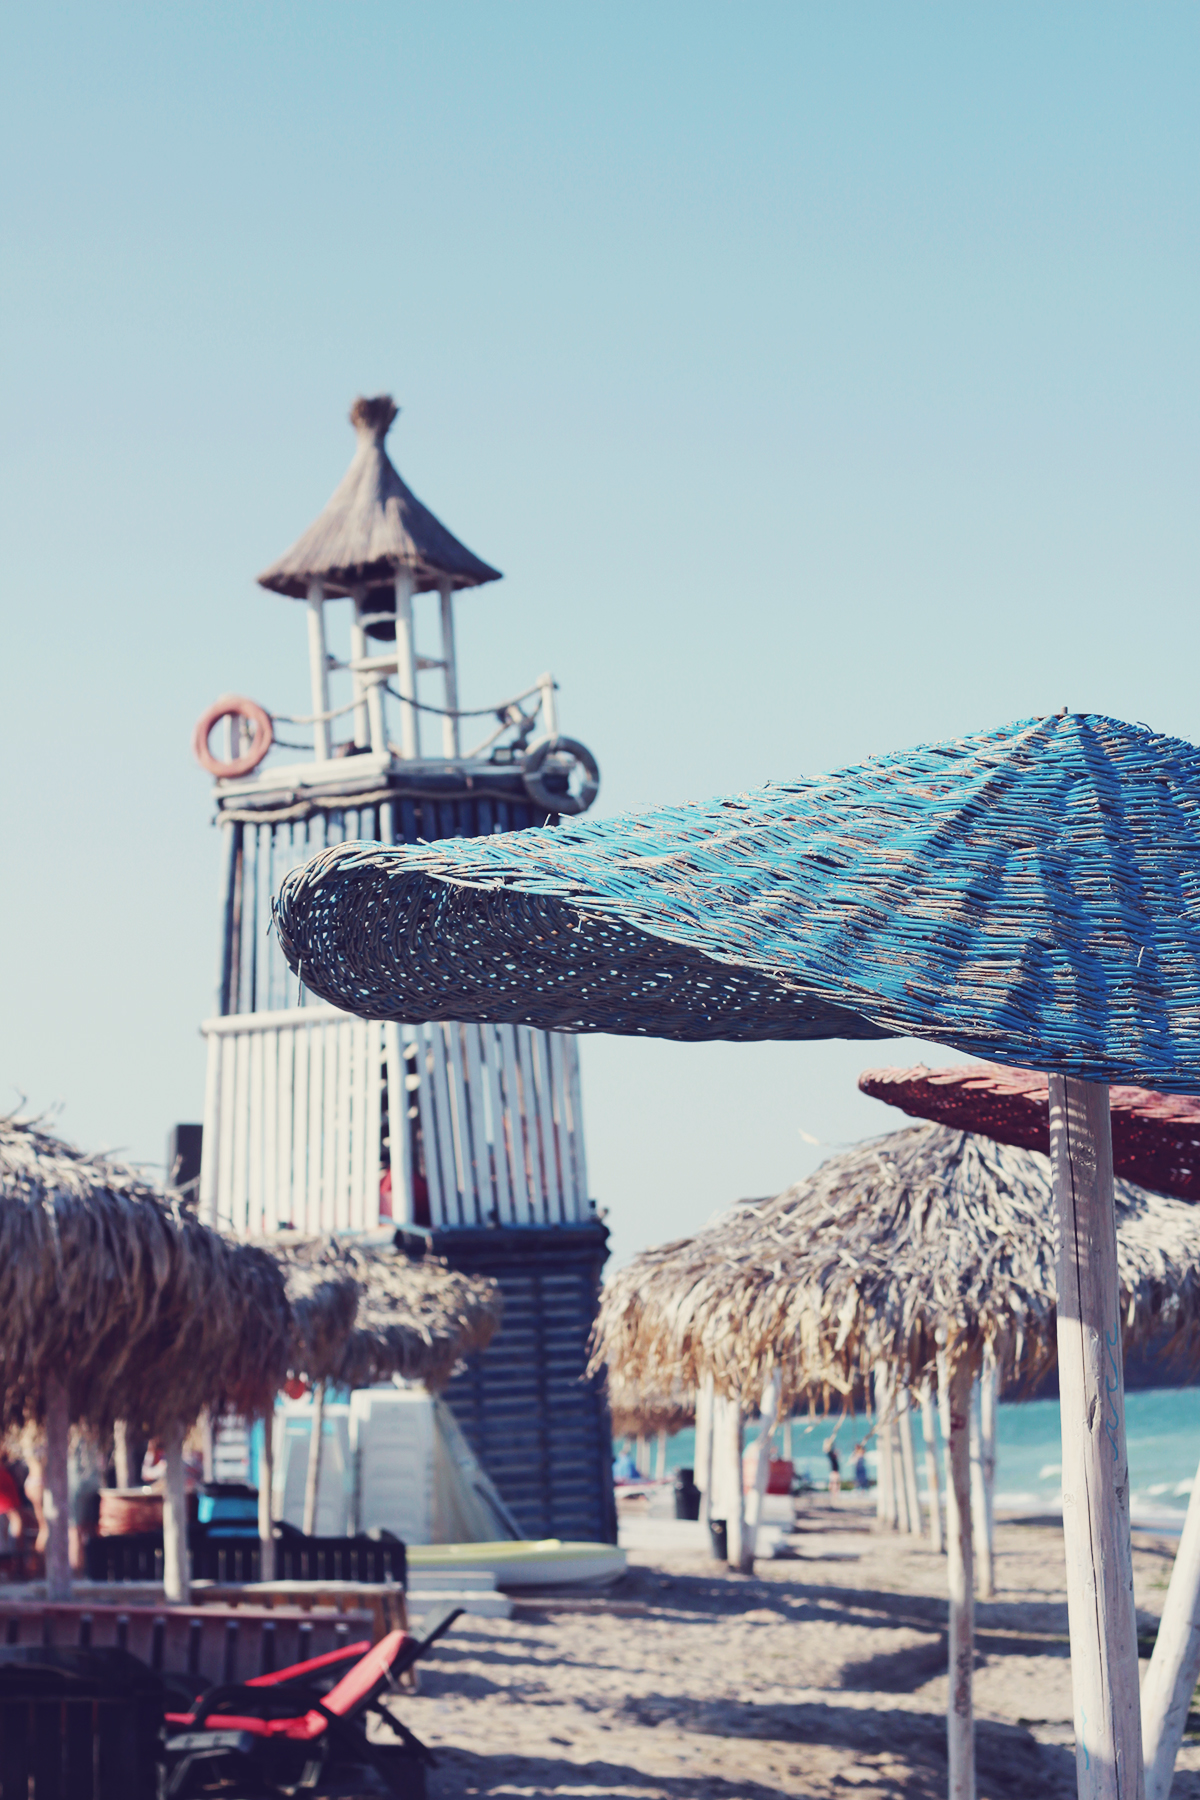 beach, vama veche, straw umbrella